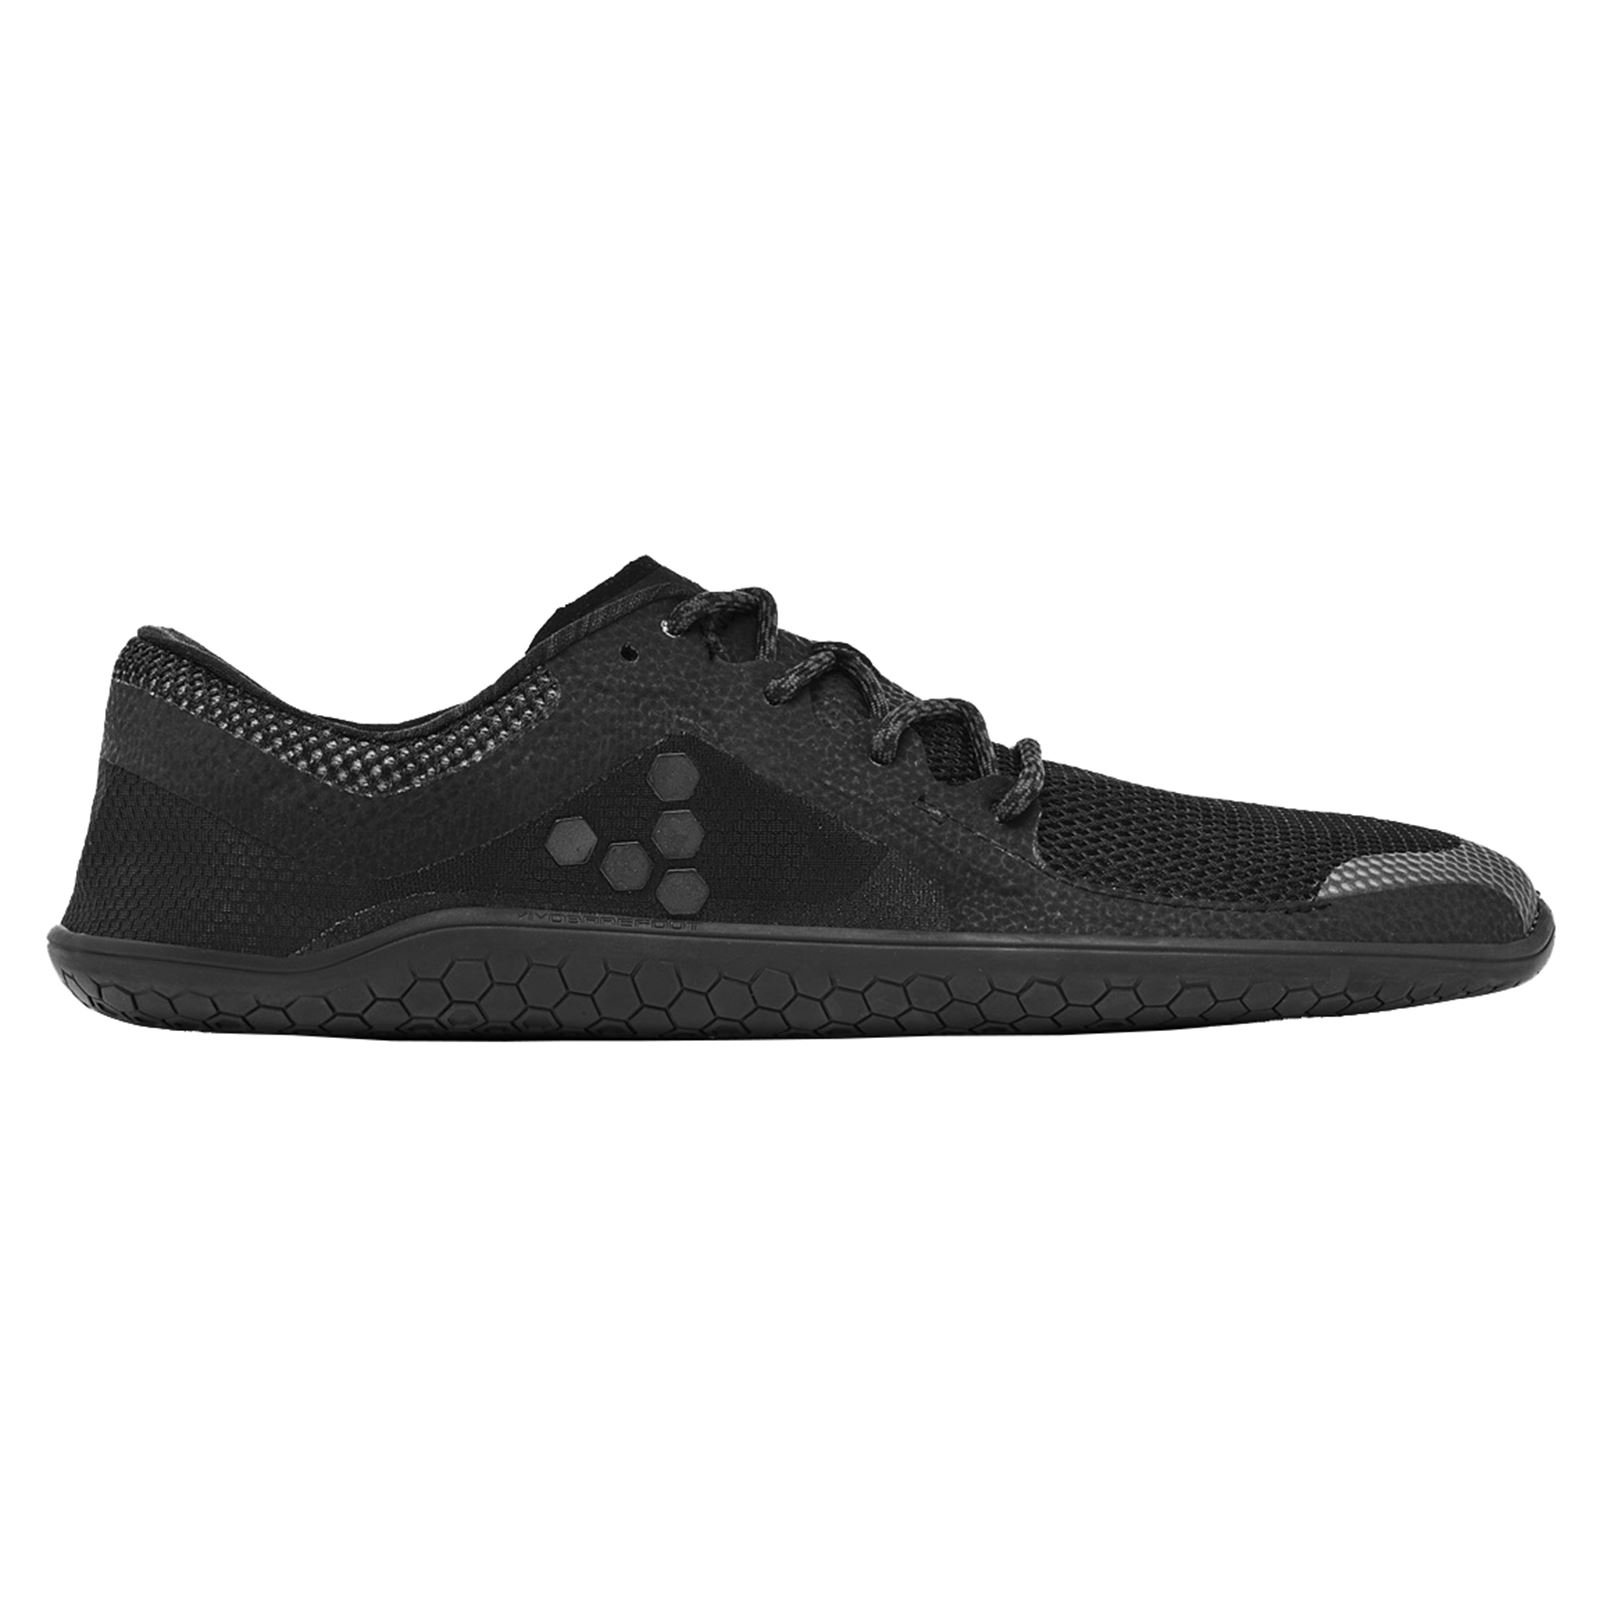 Vivobarefoot Women's Primus Lite Running Trainer Shoe, All Black, 39 D EU (8 US)